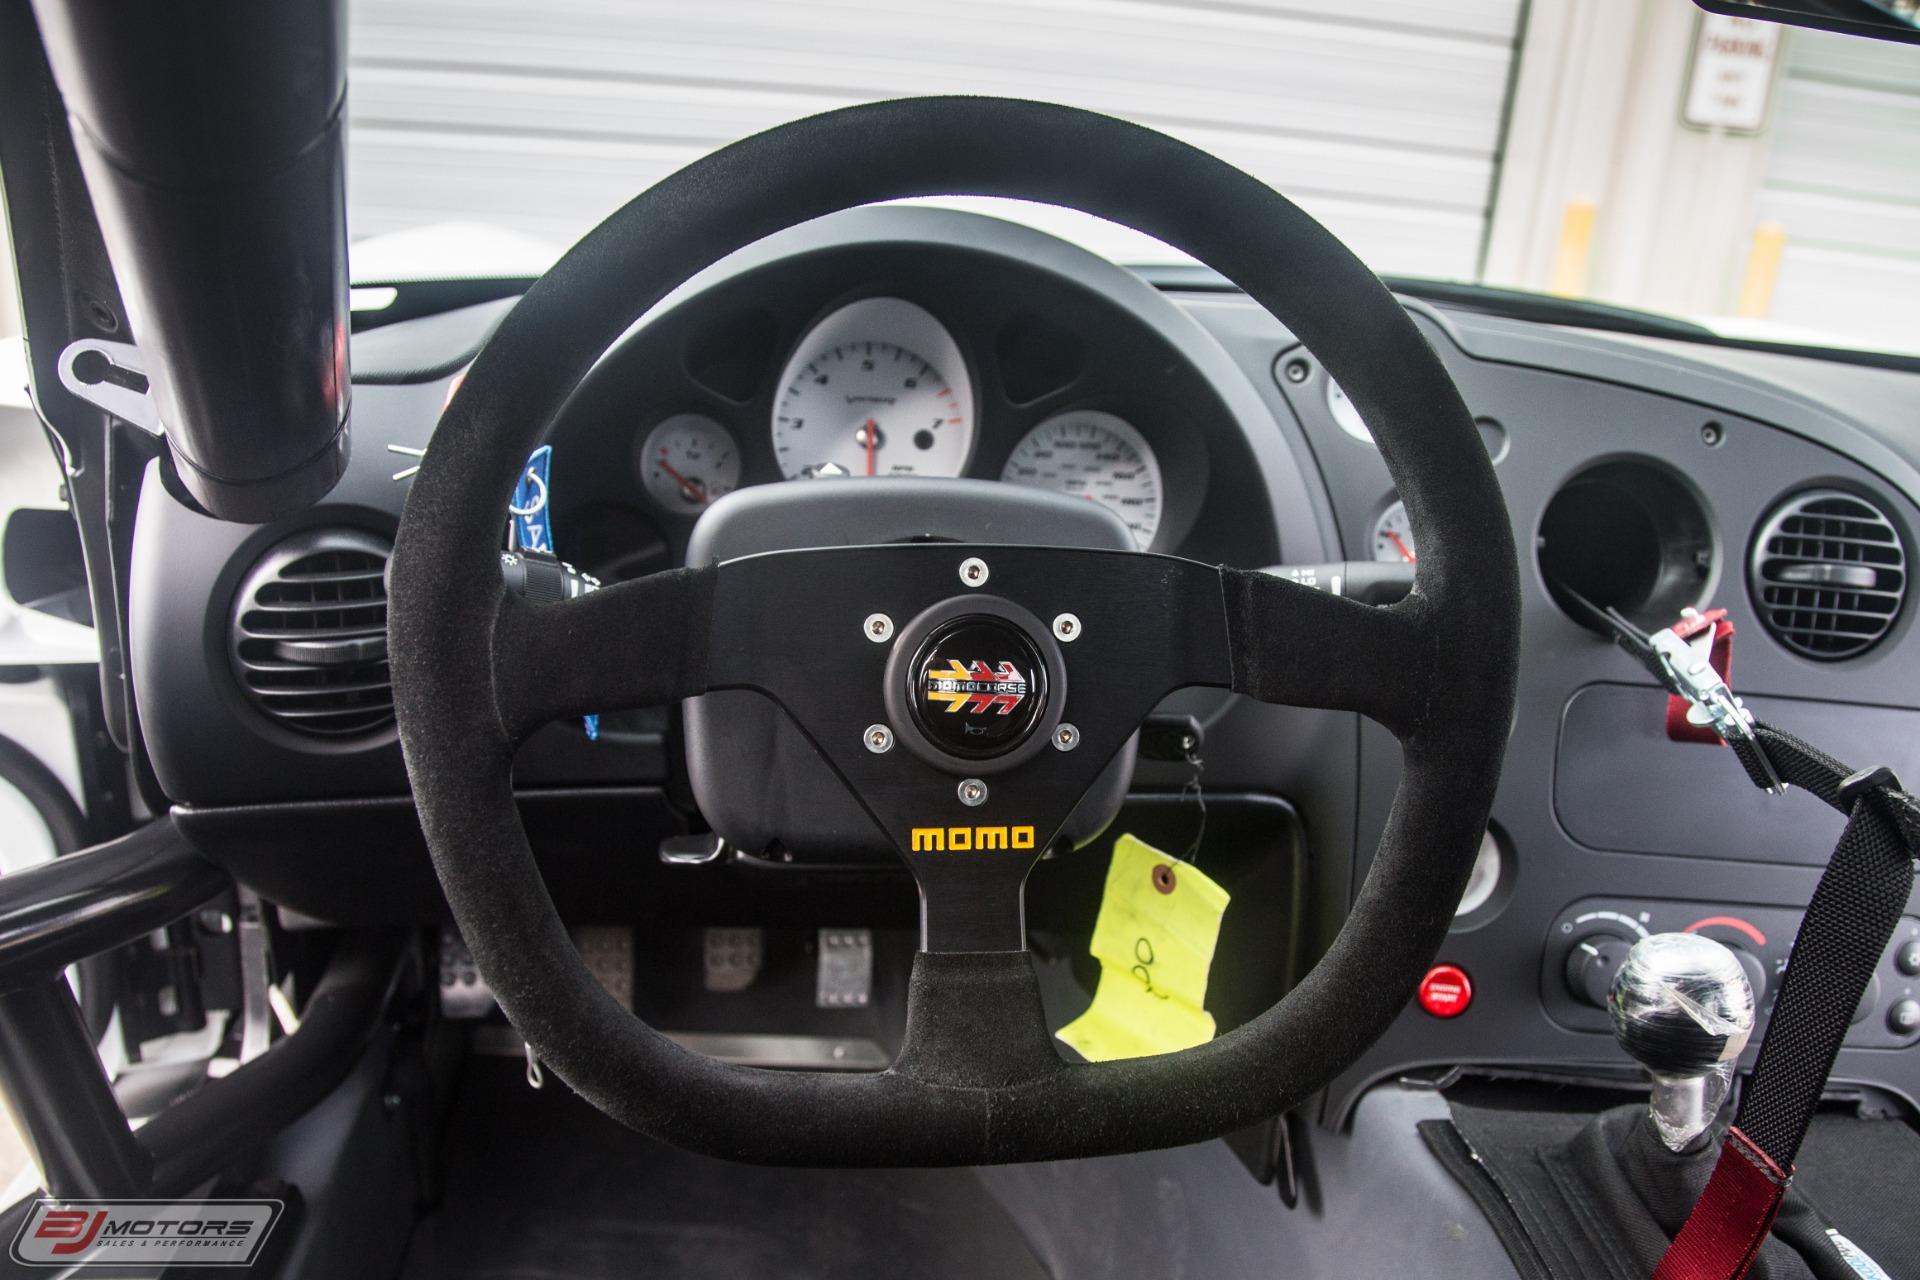 Used-2010-Dodge-Viper-New-10-Miles-ACRX-002